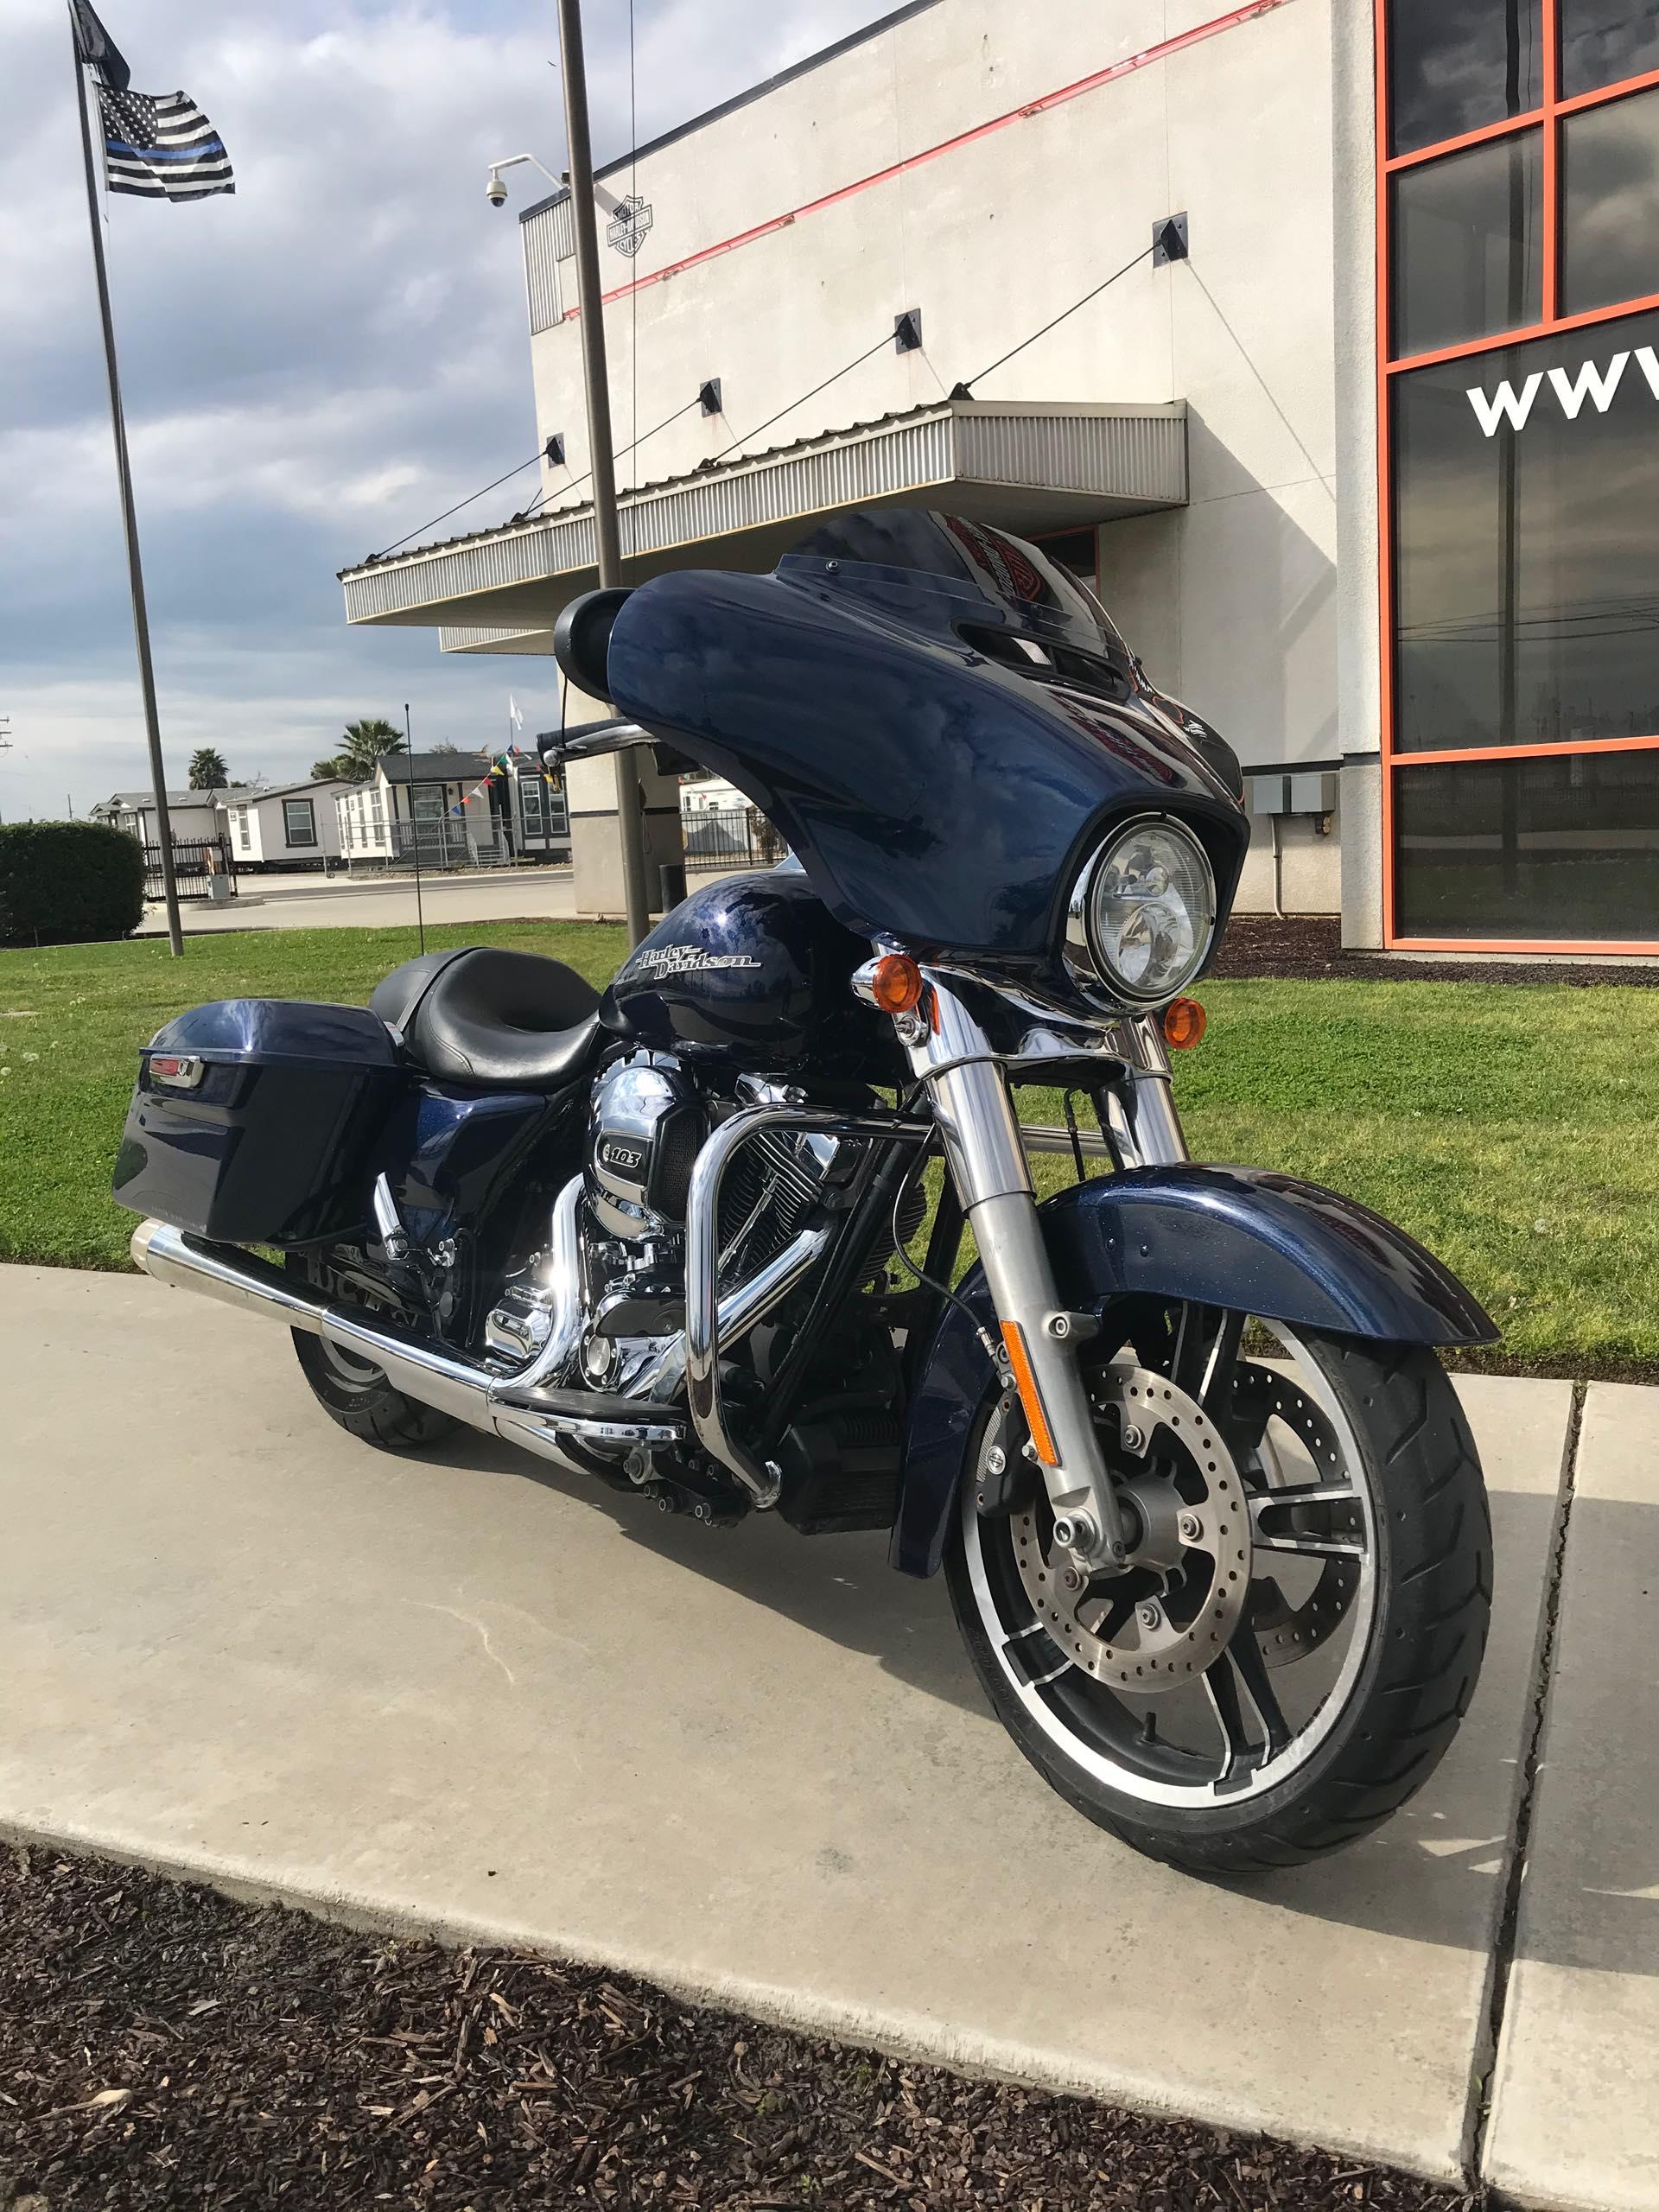 2014 Harley-Davidson Street Glide Base at Visalia Harley-Davidson